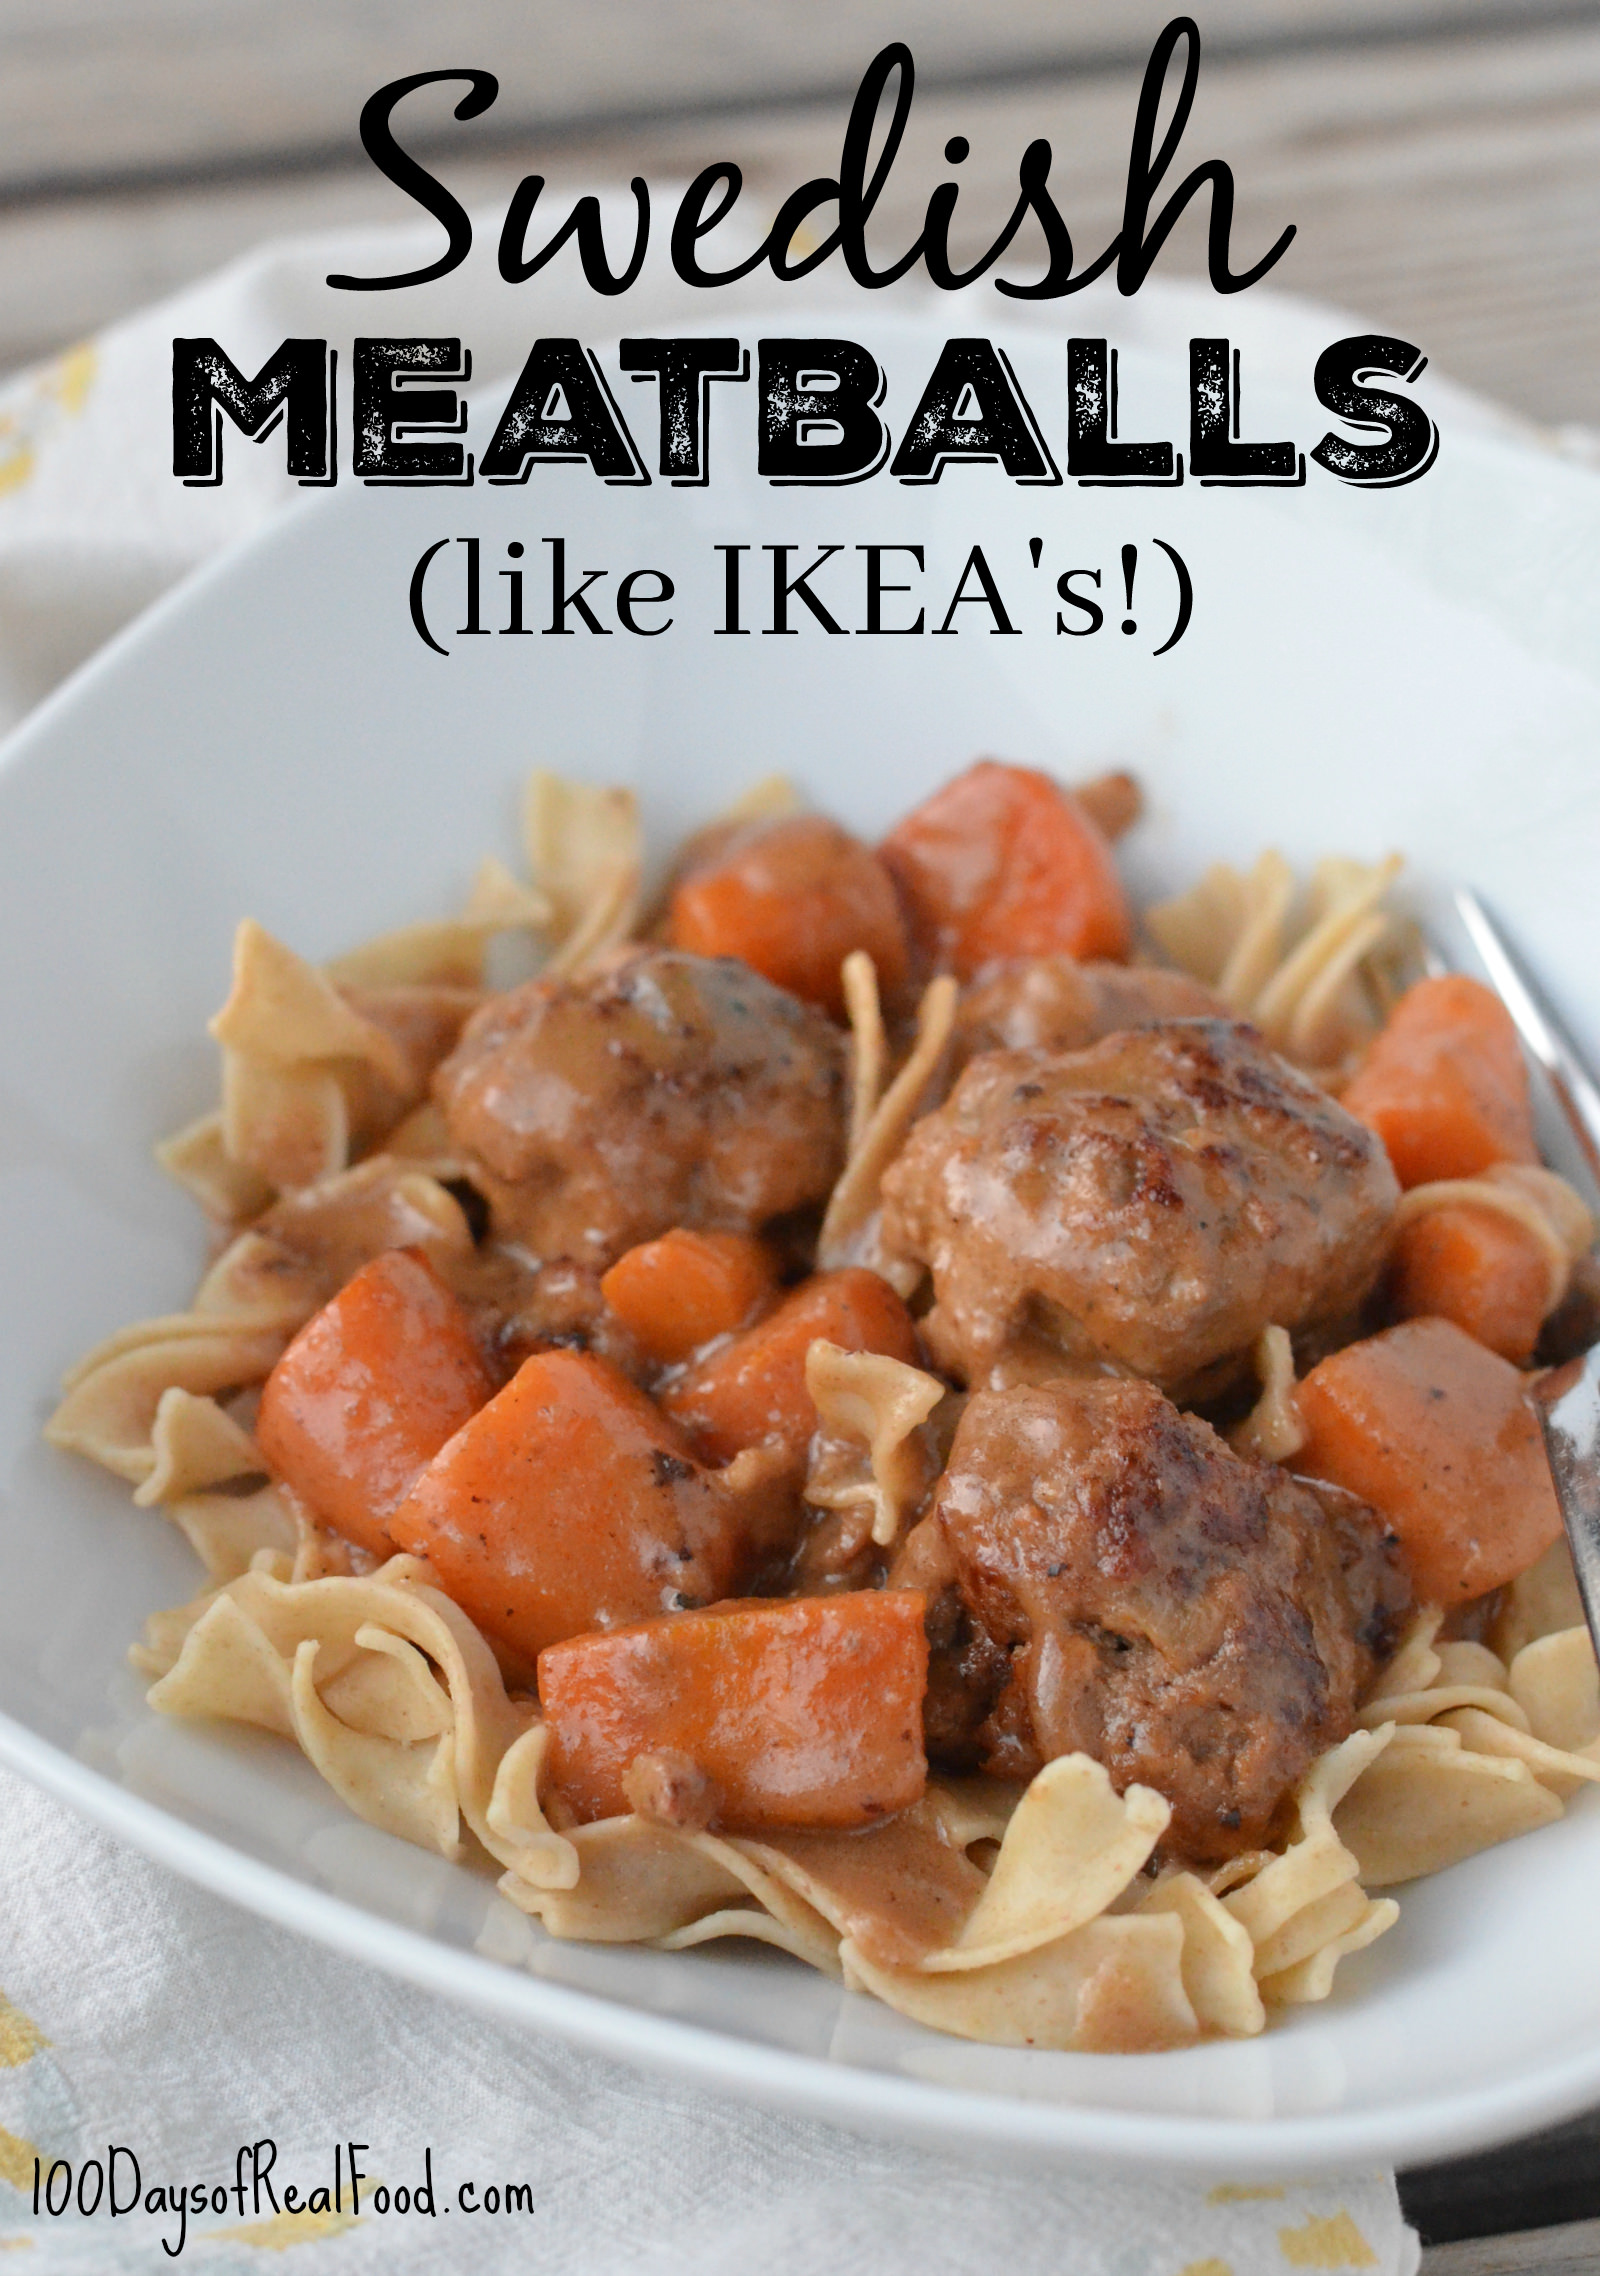 Top 10 Posts 2017: Swedish Meatballs (like IKEA's!)